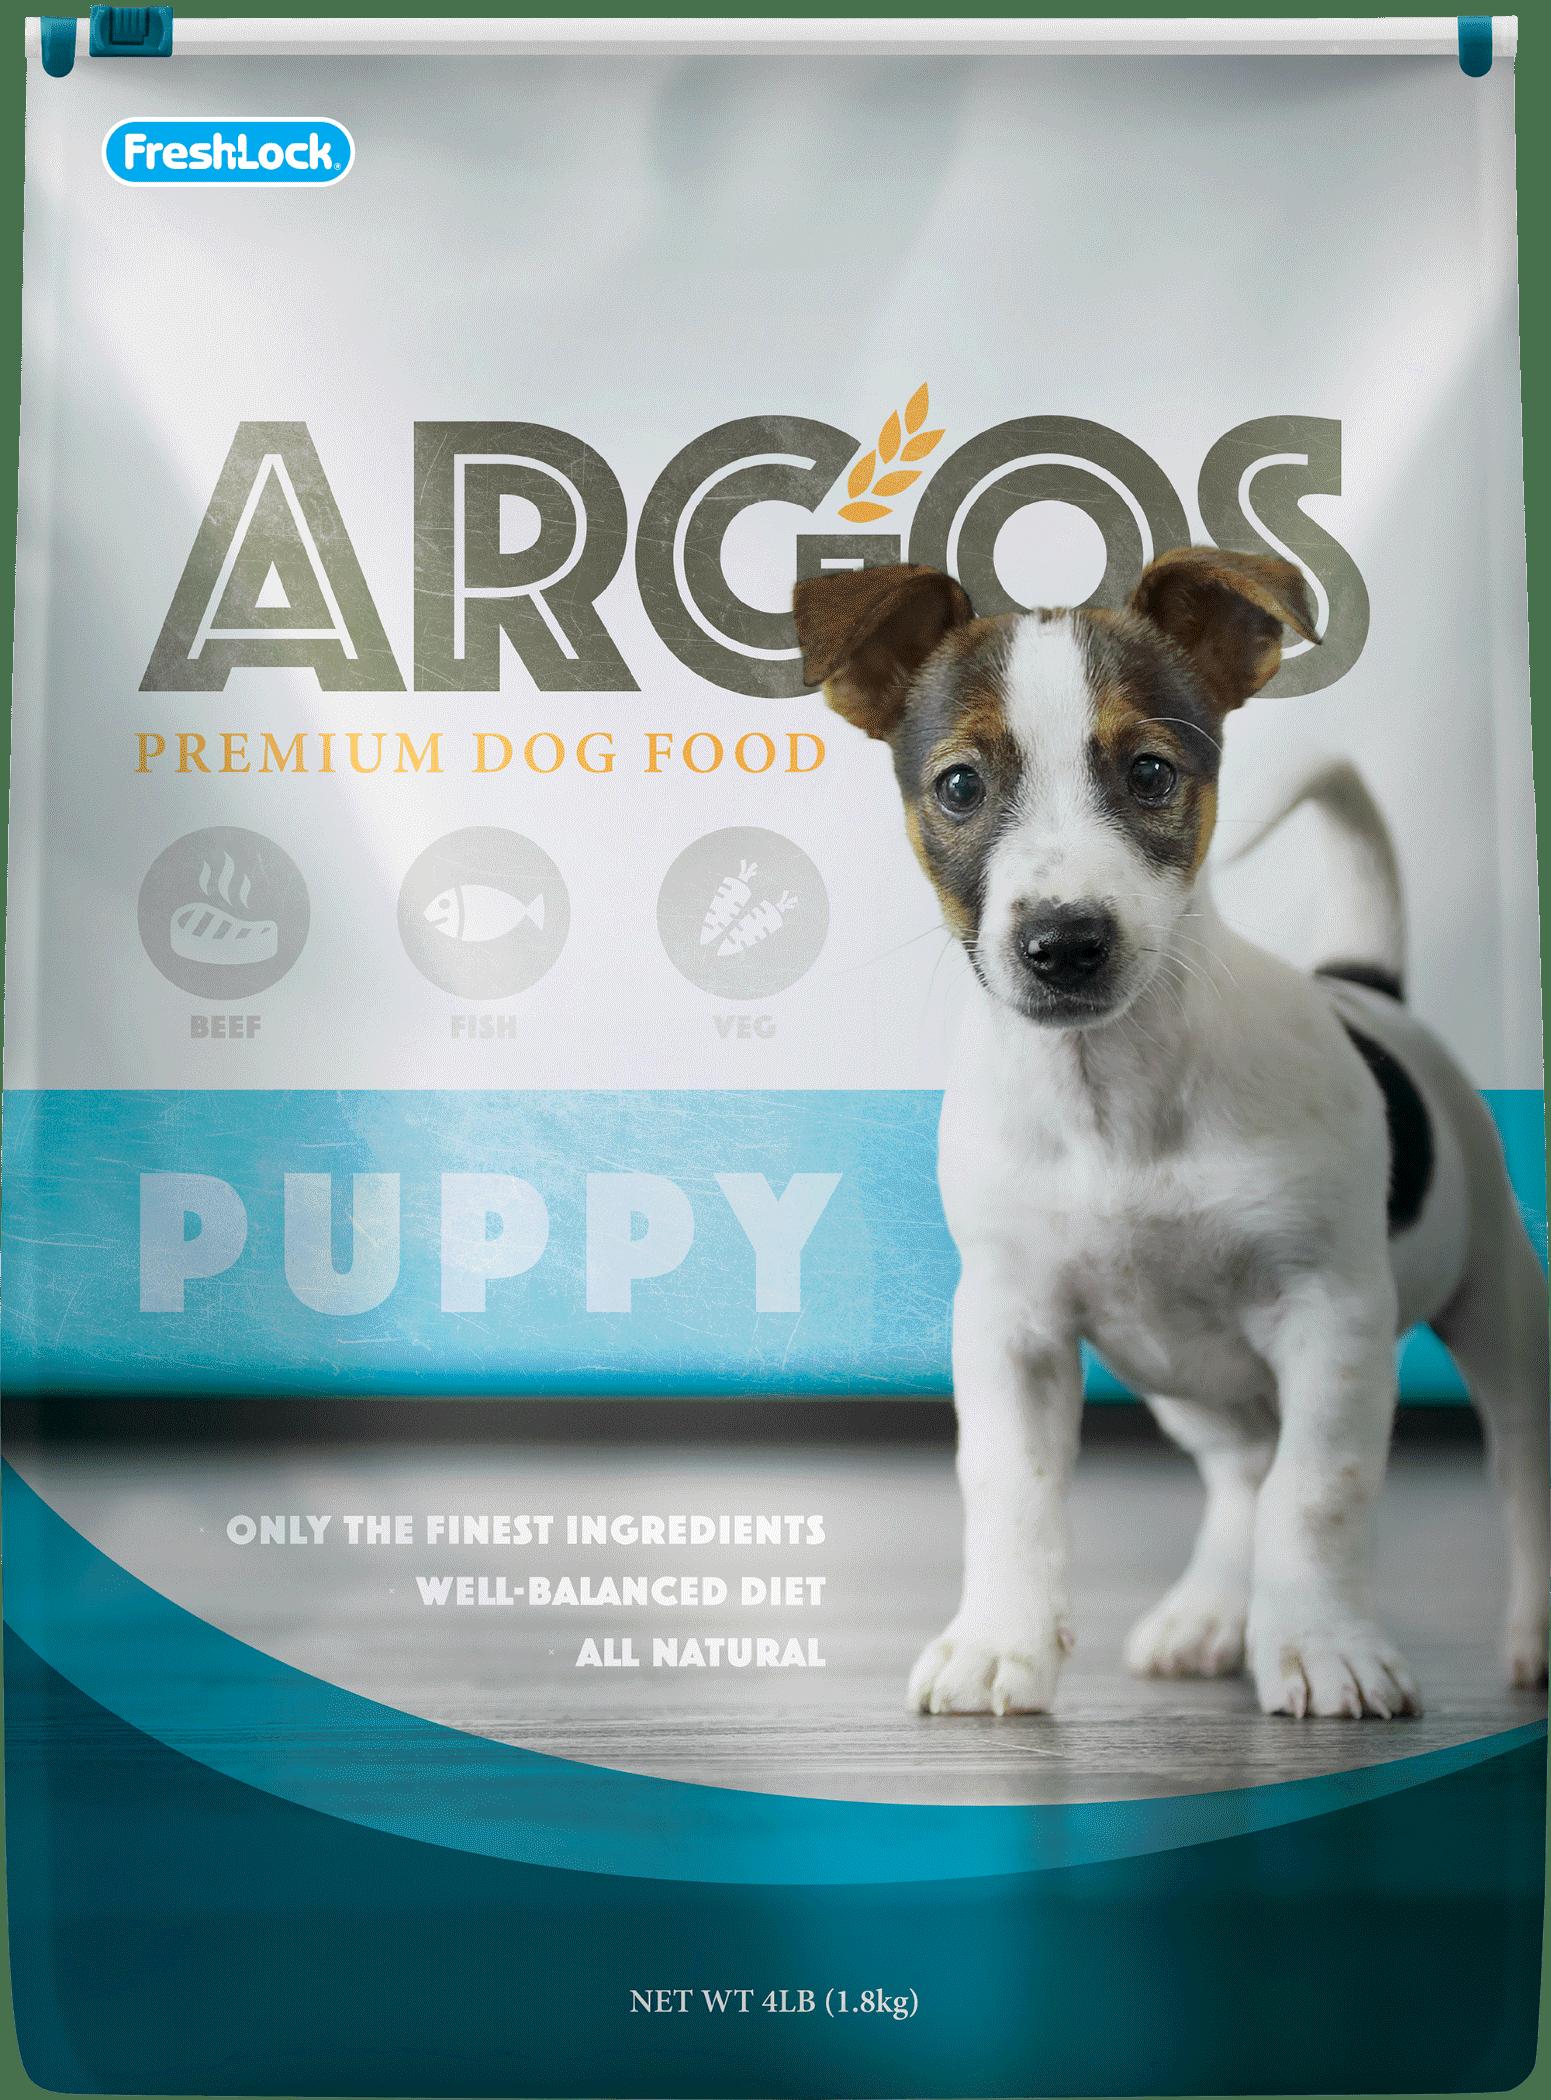 Flexographic and digital printing on a Argos dog food bag